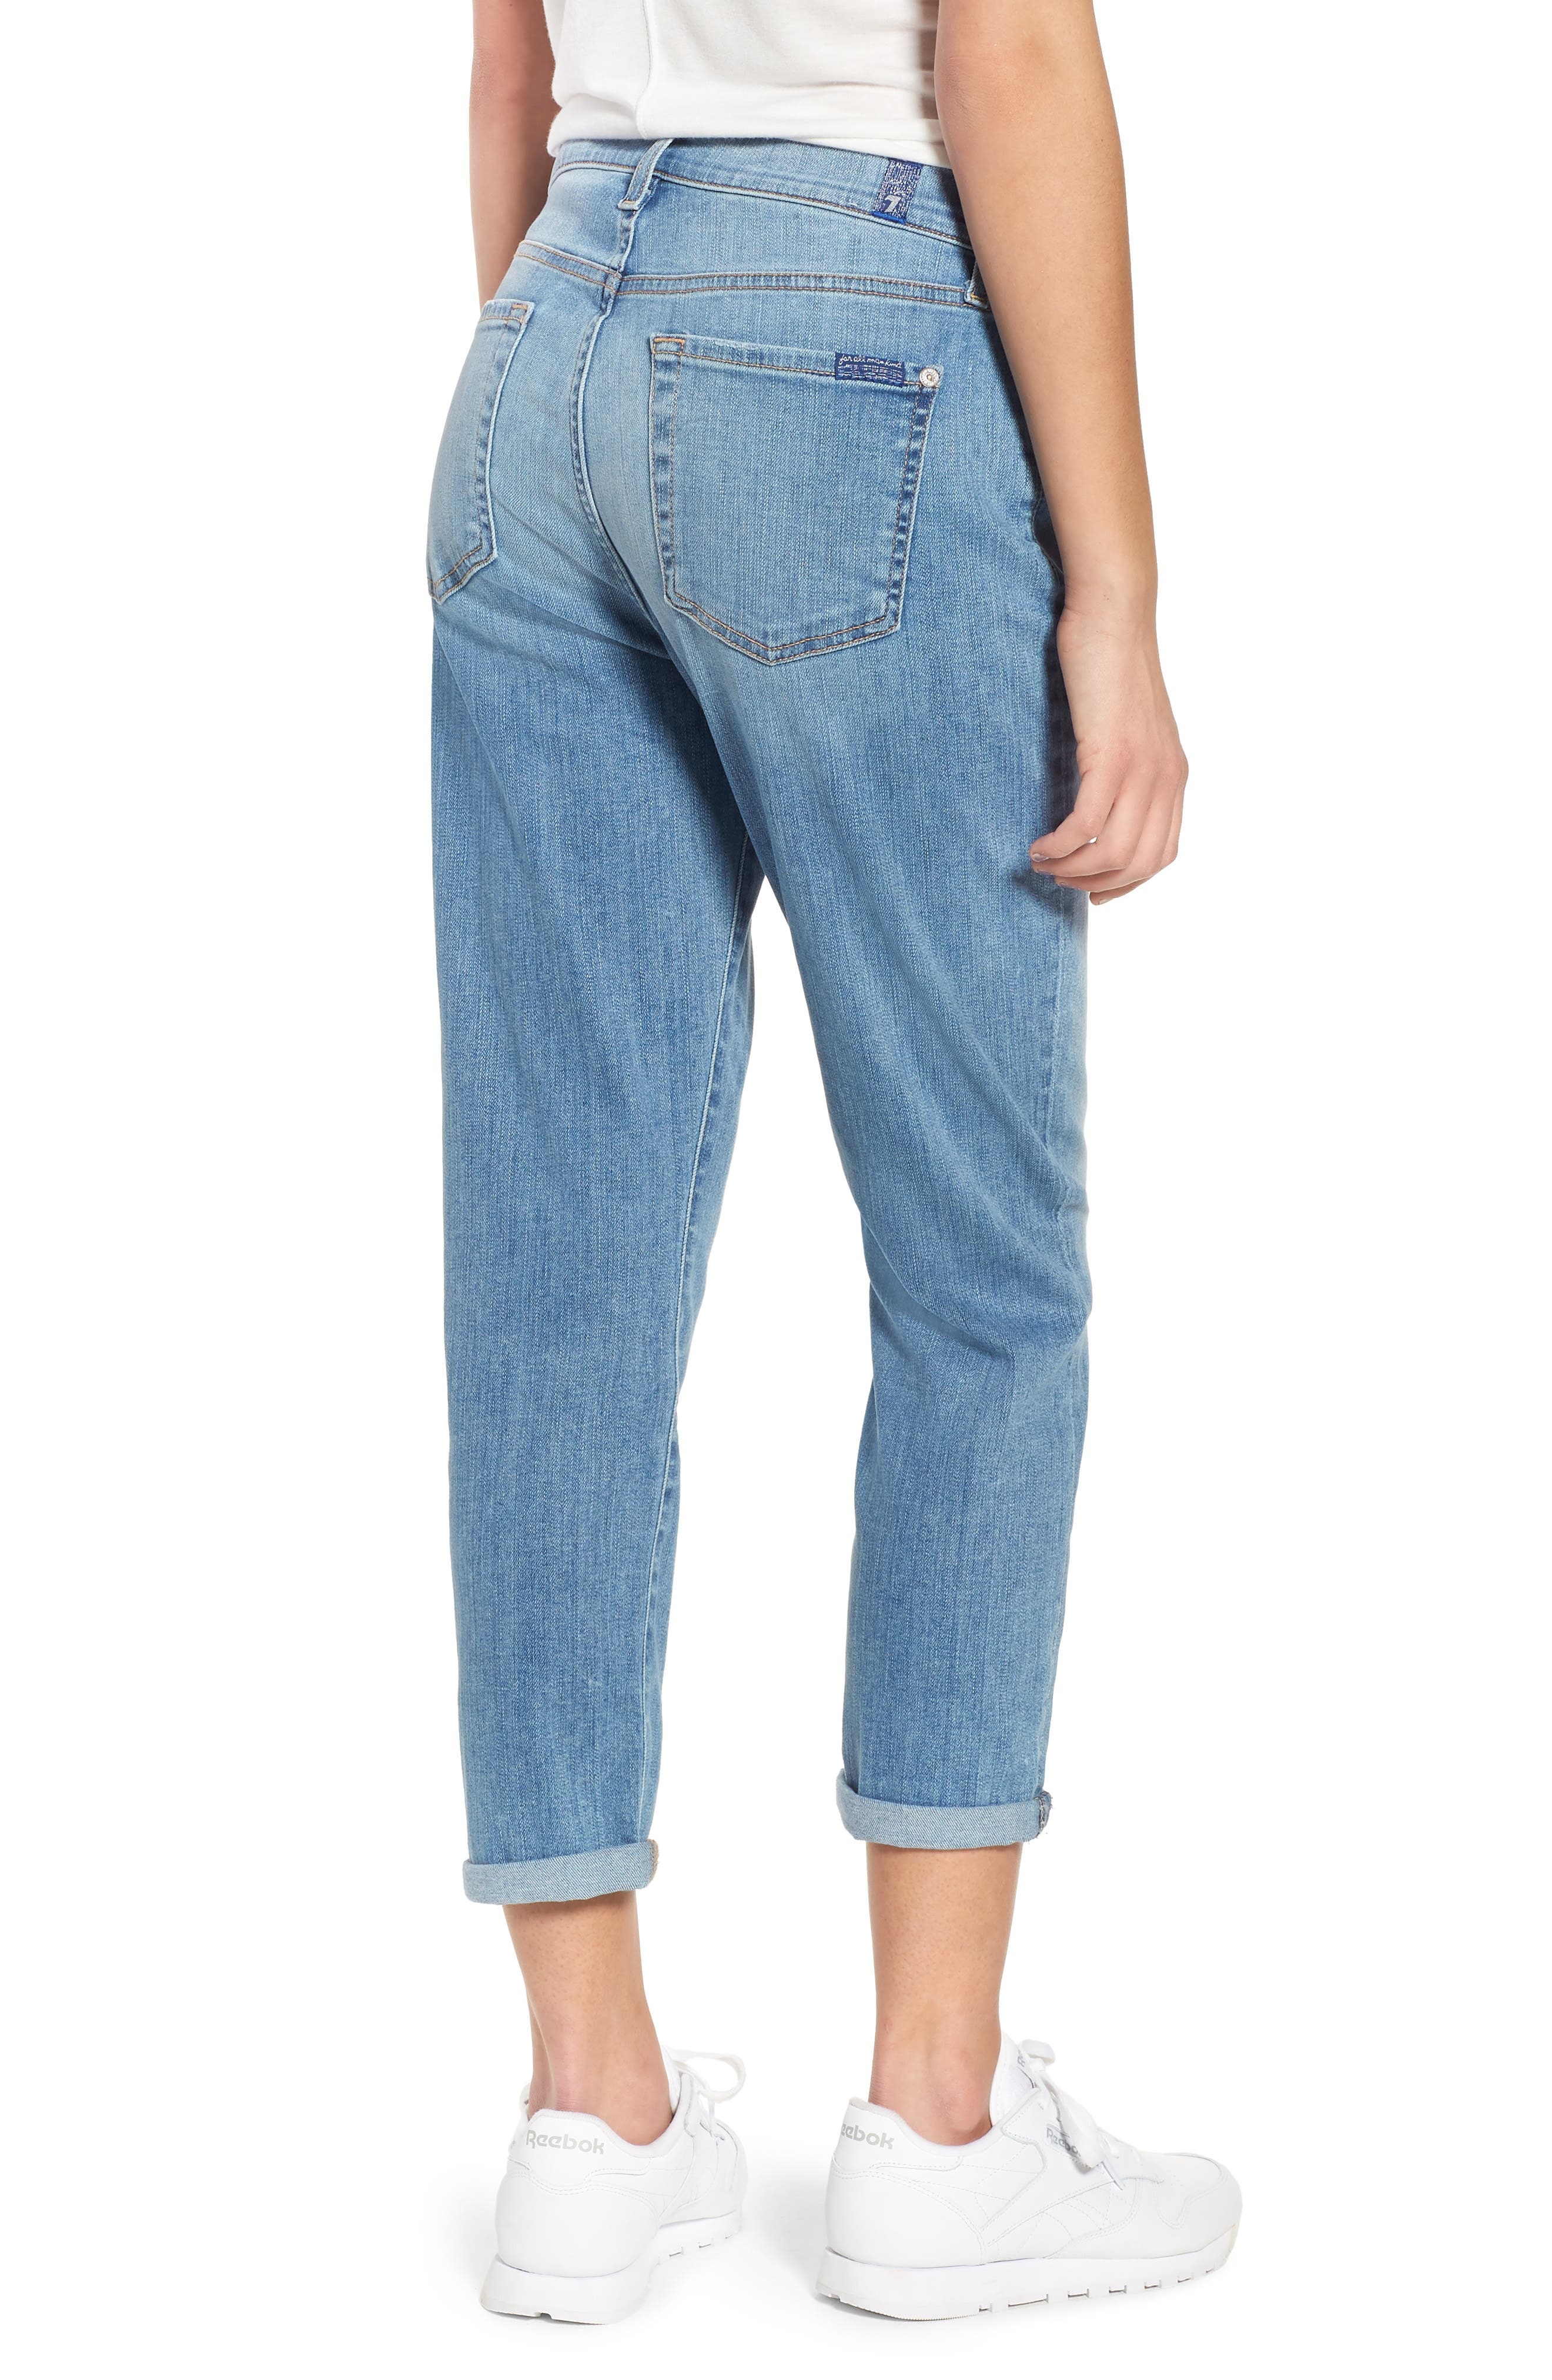 Josefina High Waist Boyfriend Jeans,                             Alternate thumbnail 2, color,